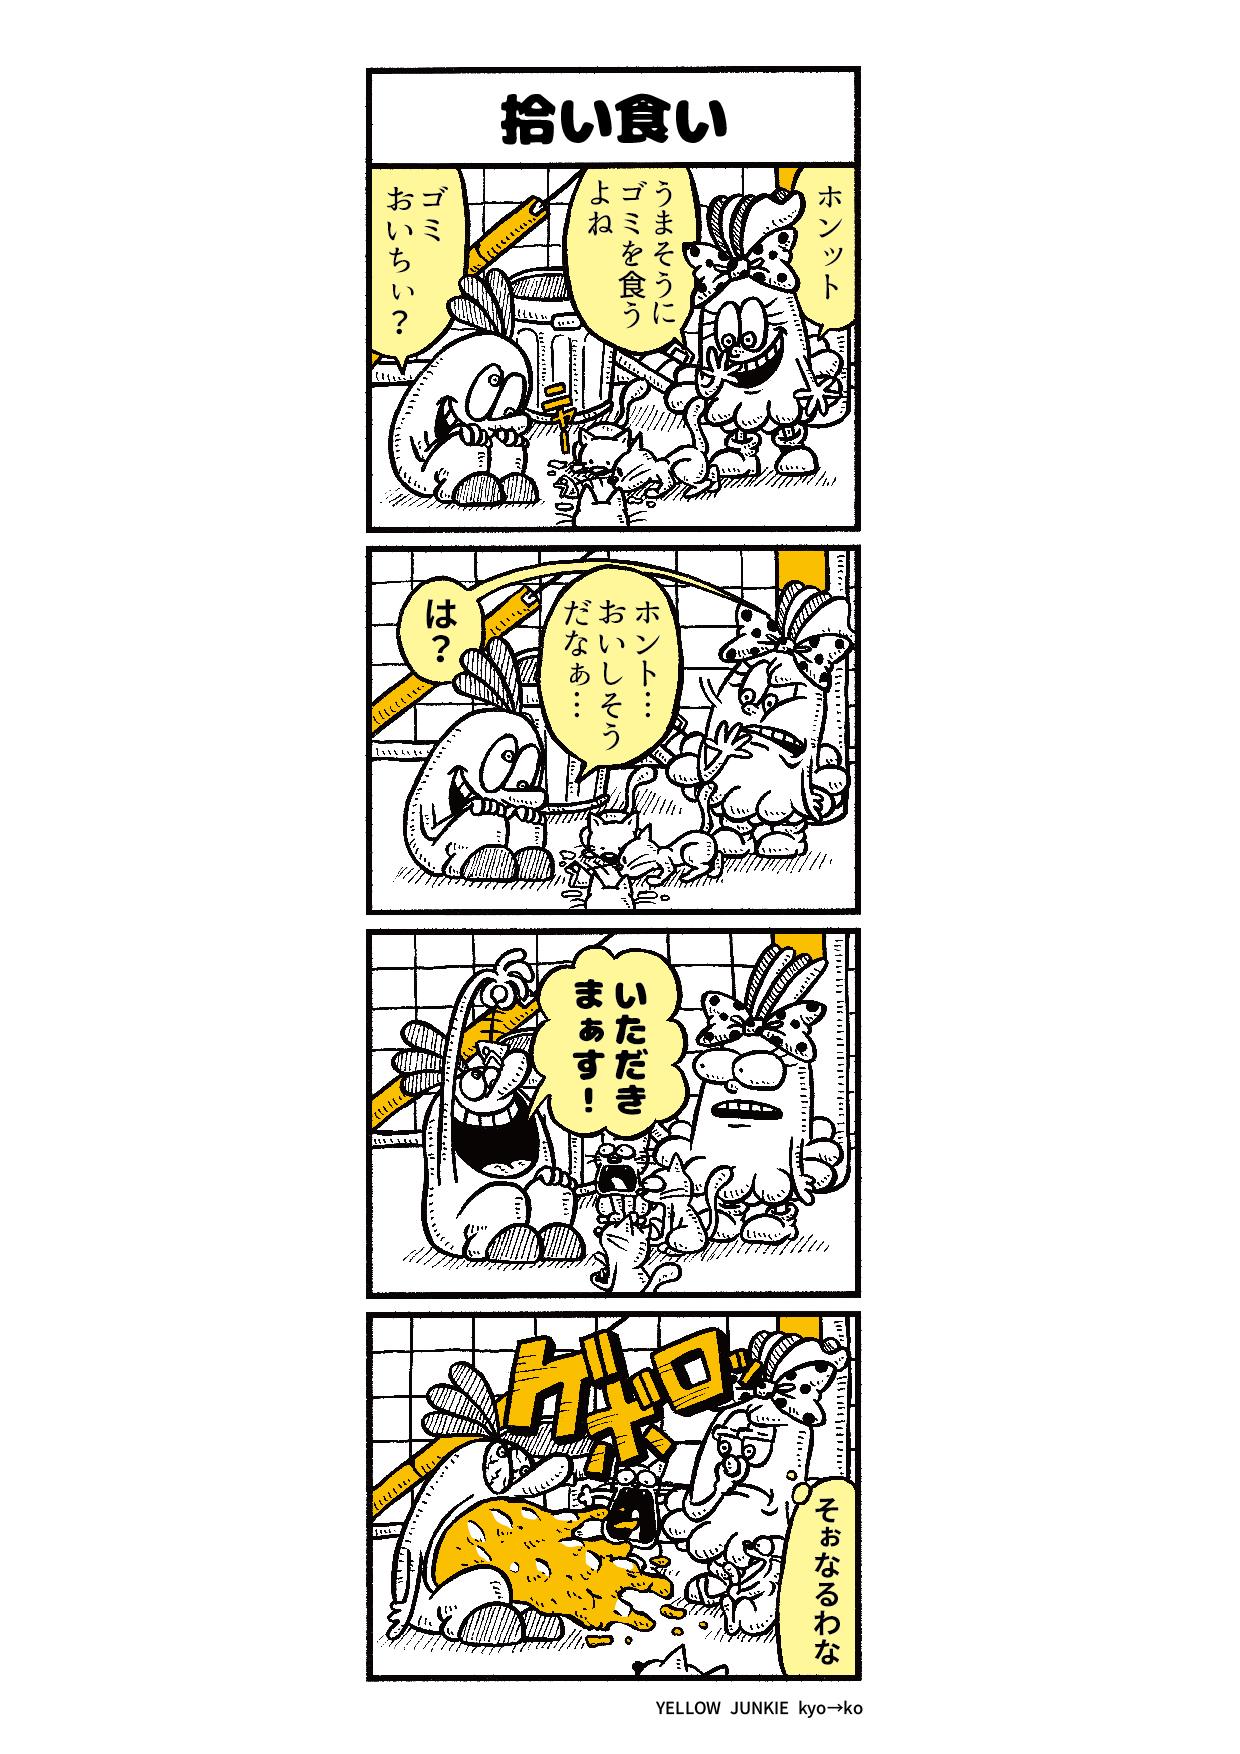 YELLOW JUNKIE「23話:拾い食い」